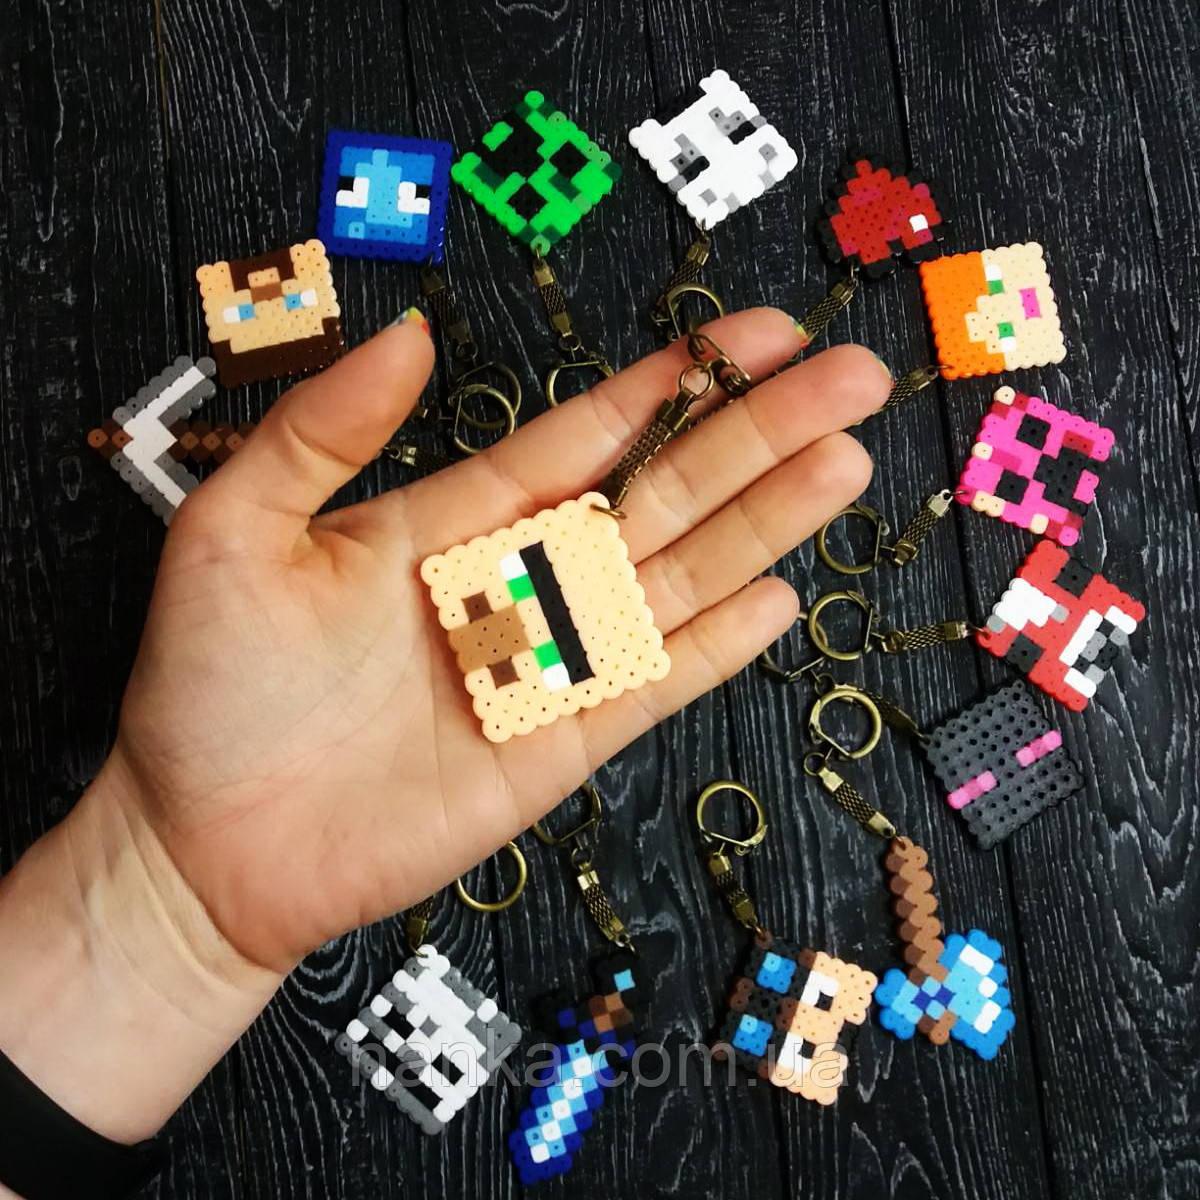 Брелок серия Minecraft, Майнкрафт Villager